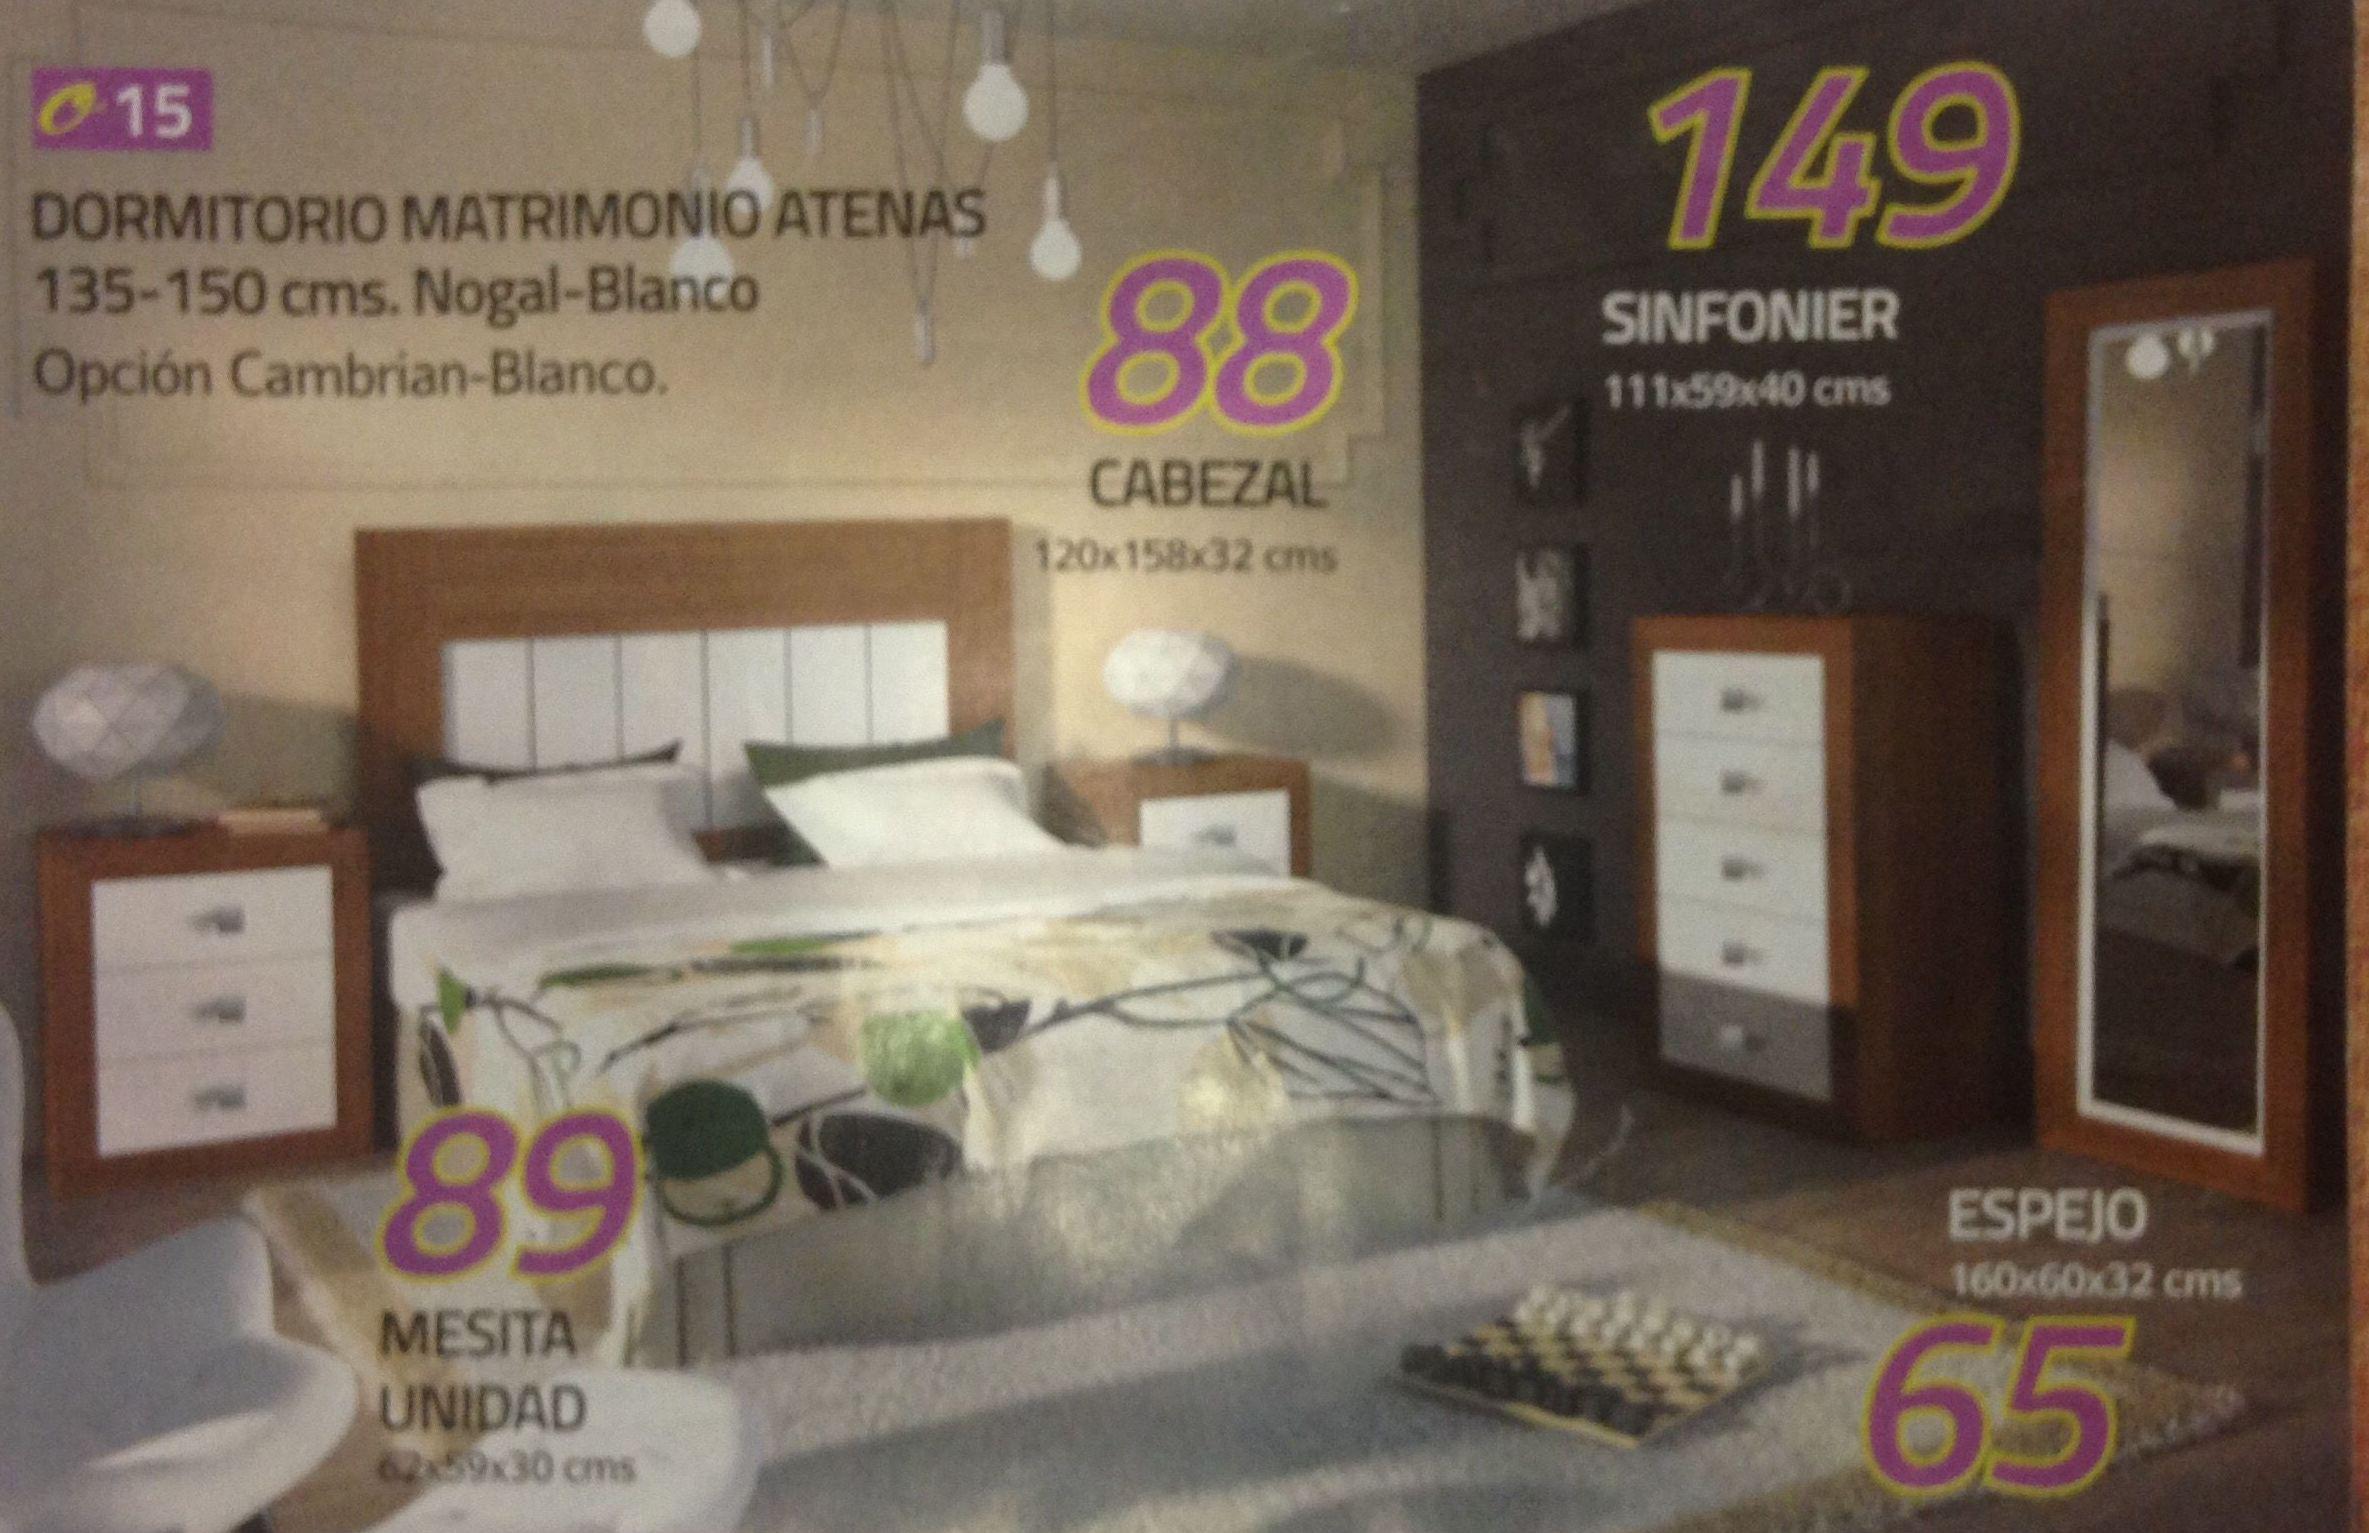 dormitorio matrimonio atenas: Productos  de Muebles Llueca, S. L.